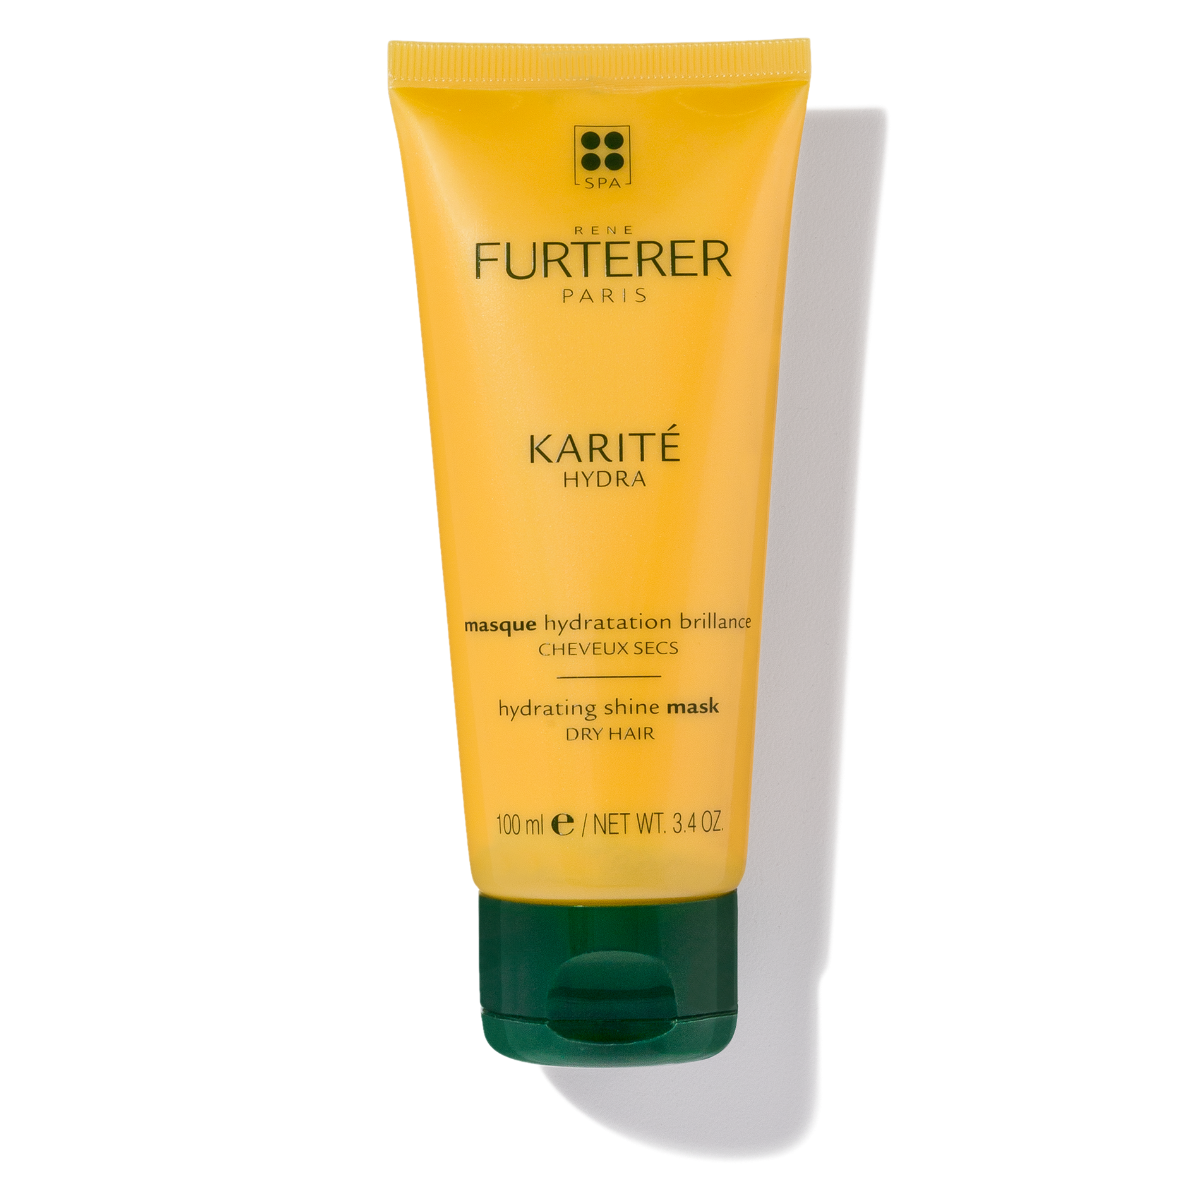 Rene Furterer KARITE HYDRA Hydrating Shine Mask